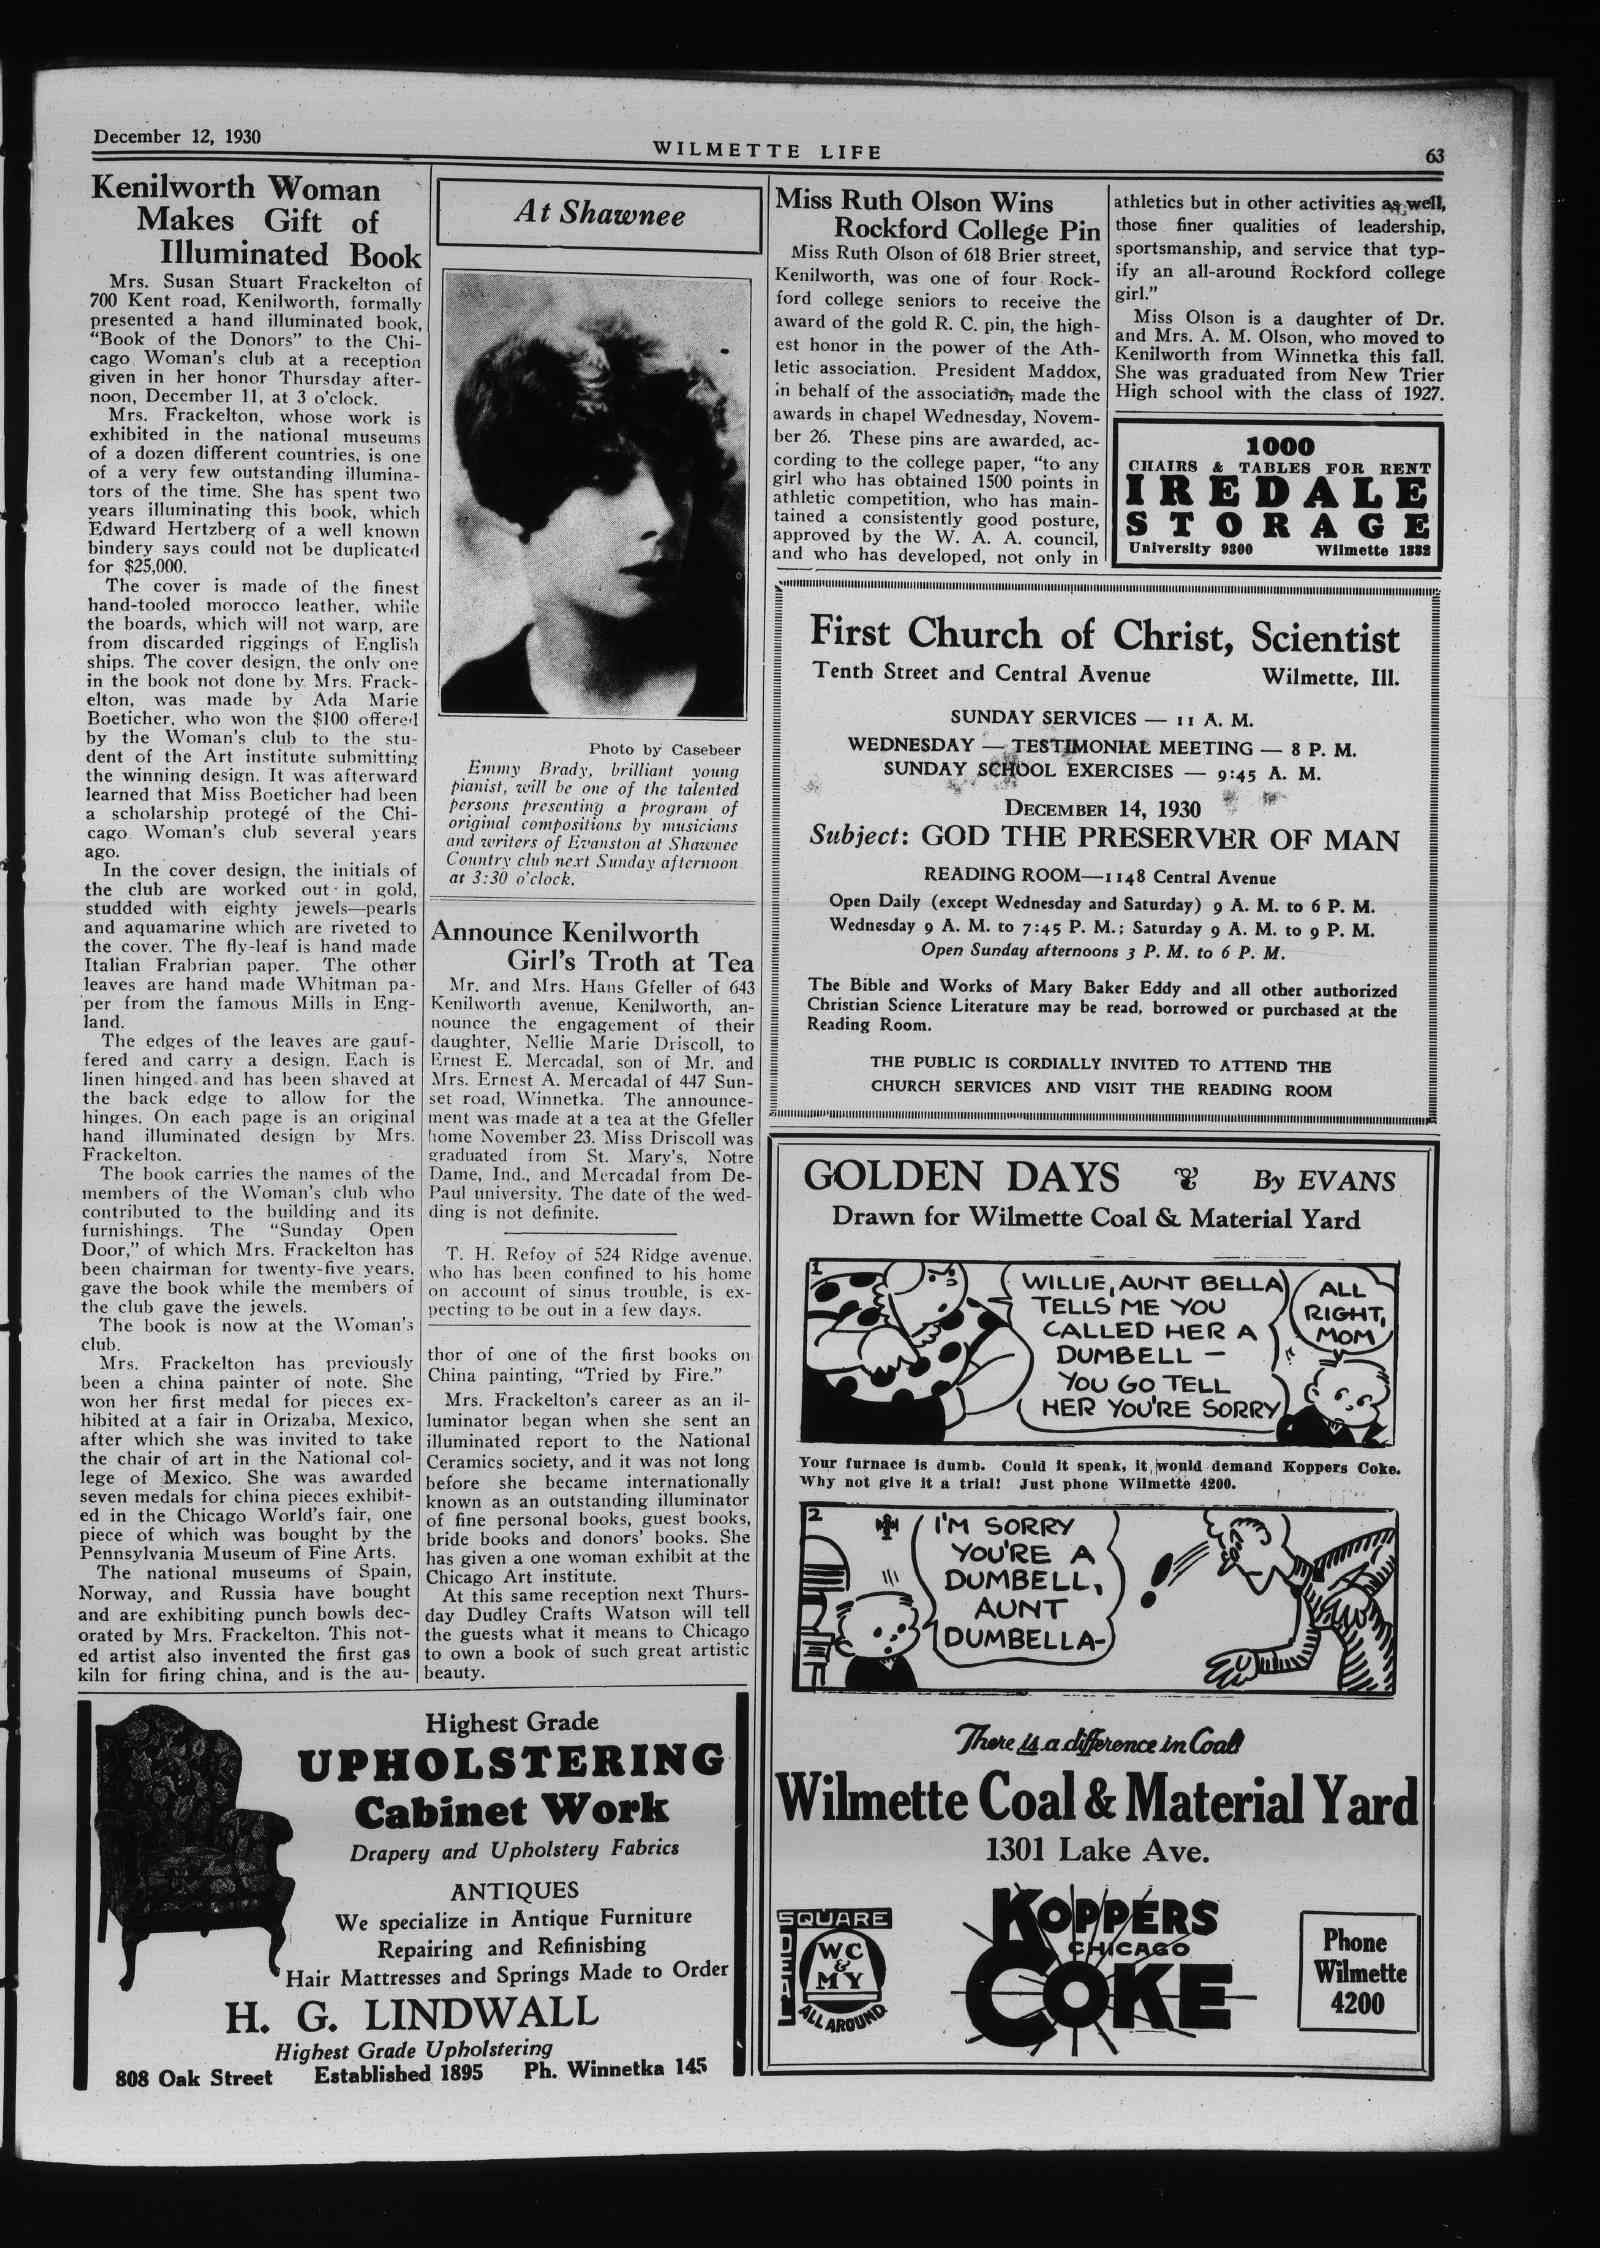 Wilmette Life (Wilmette, Illinois), 12 Dec 1930